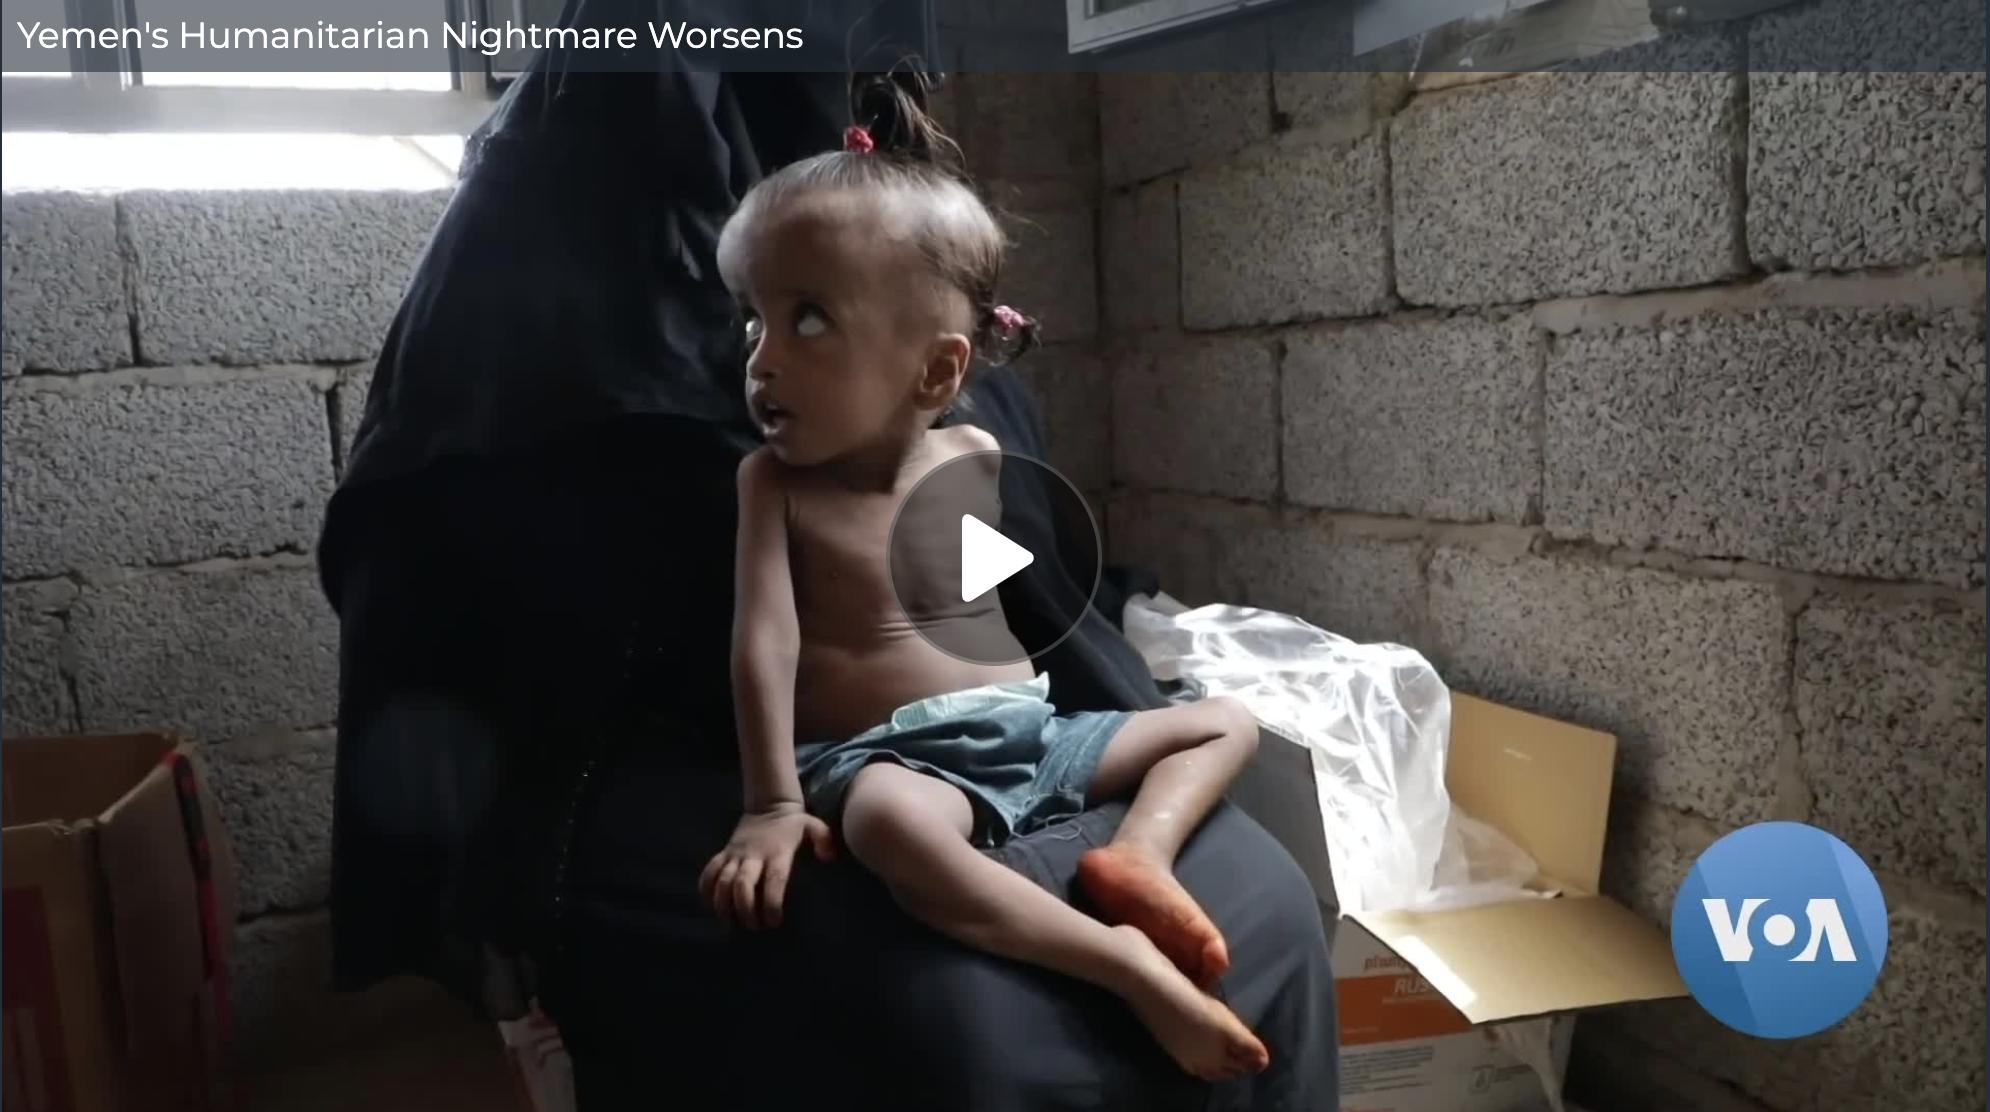 Yemen's Humanitarian Crisis Worsens – Voice of America (image)